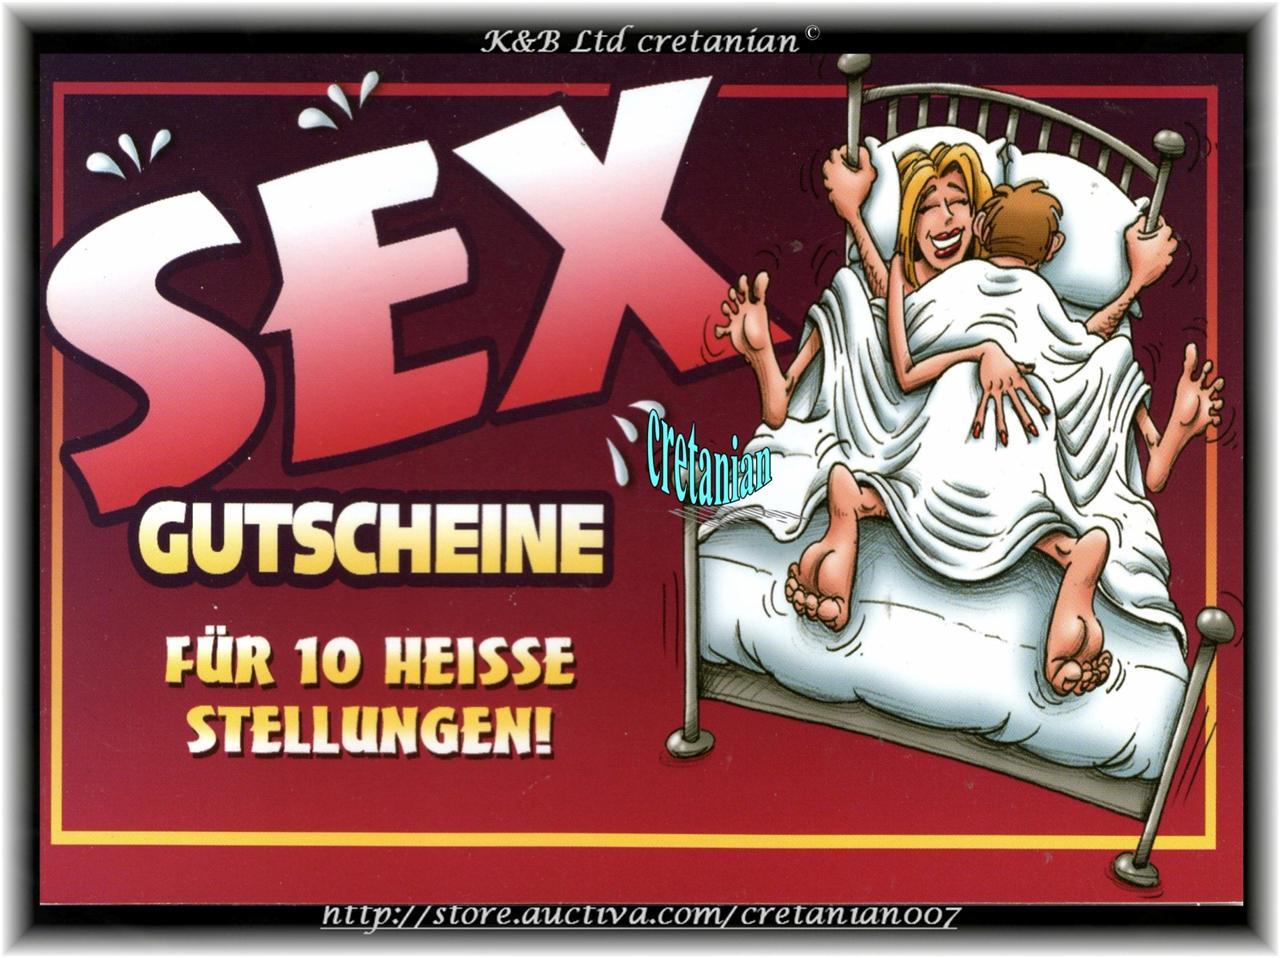 sex gummersbach gutschein eventtime